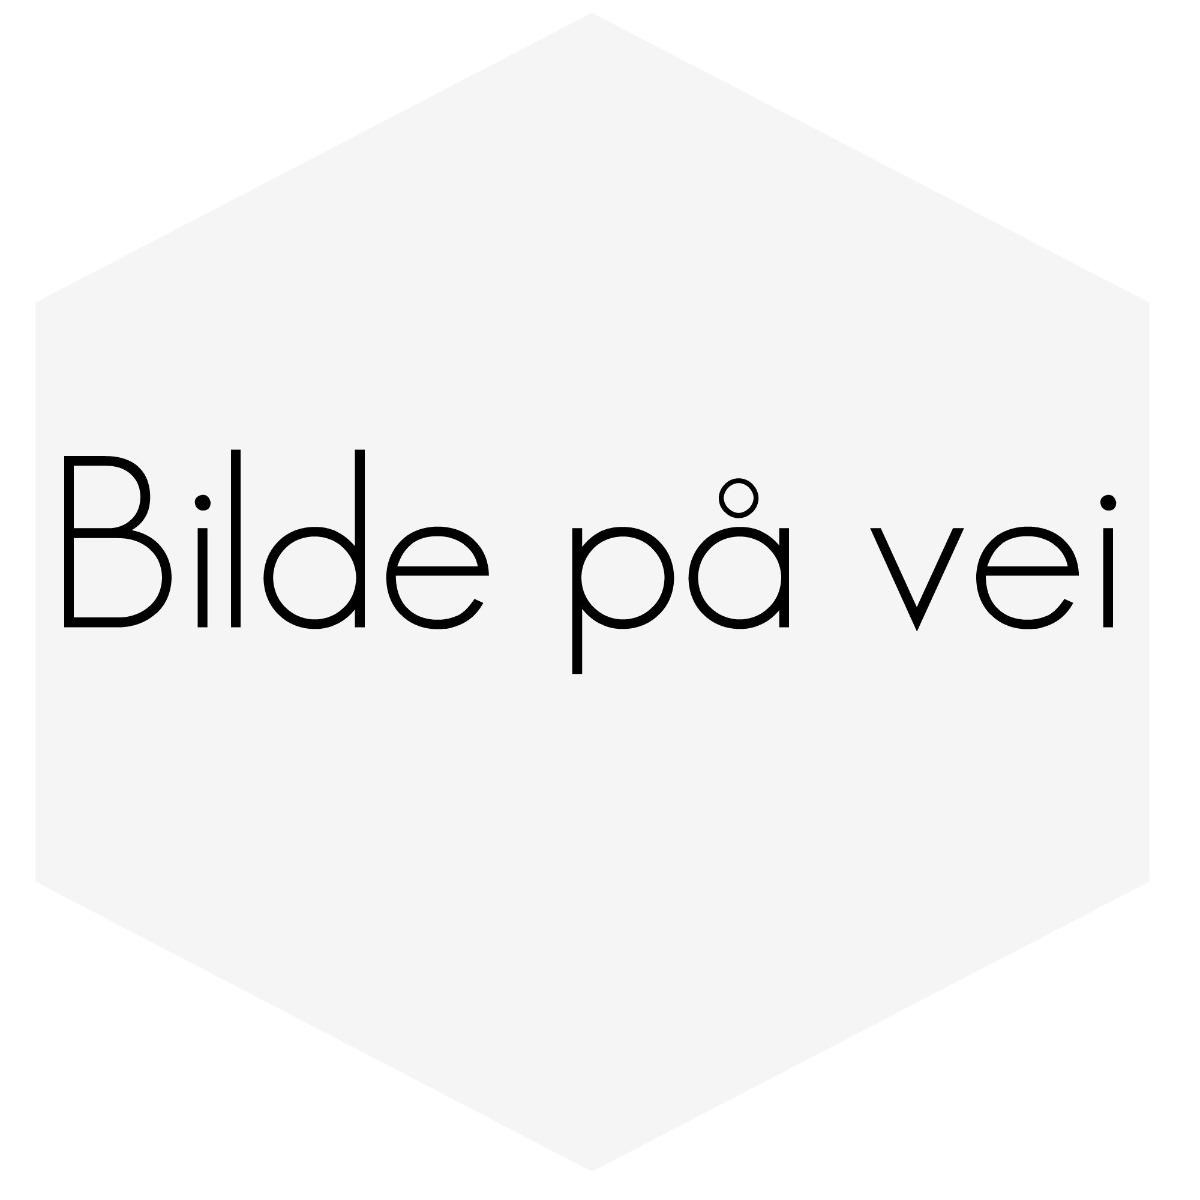 SPOILERLAMPE/FOGLAMP VOLVO S60 05>09 HØYRE 8693336